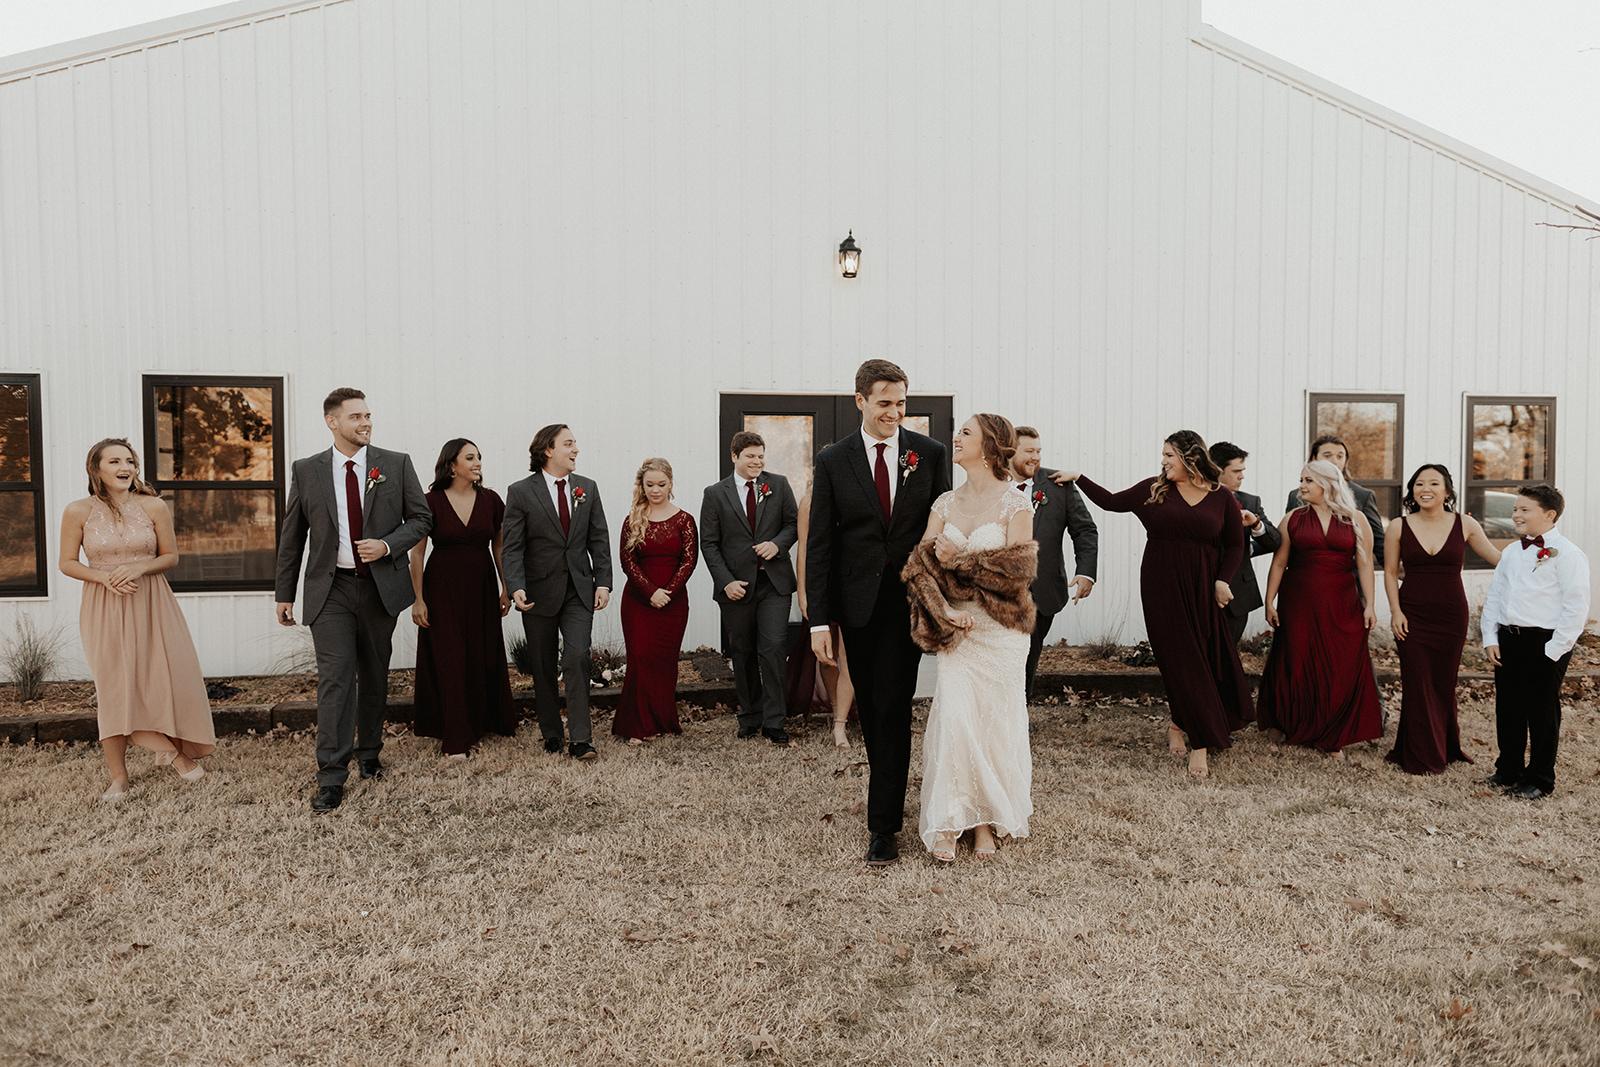 Best Wedding Venue in Tulsa Bixby Dream Point Ranch 20i.jpg